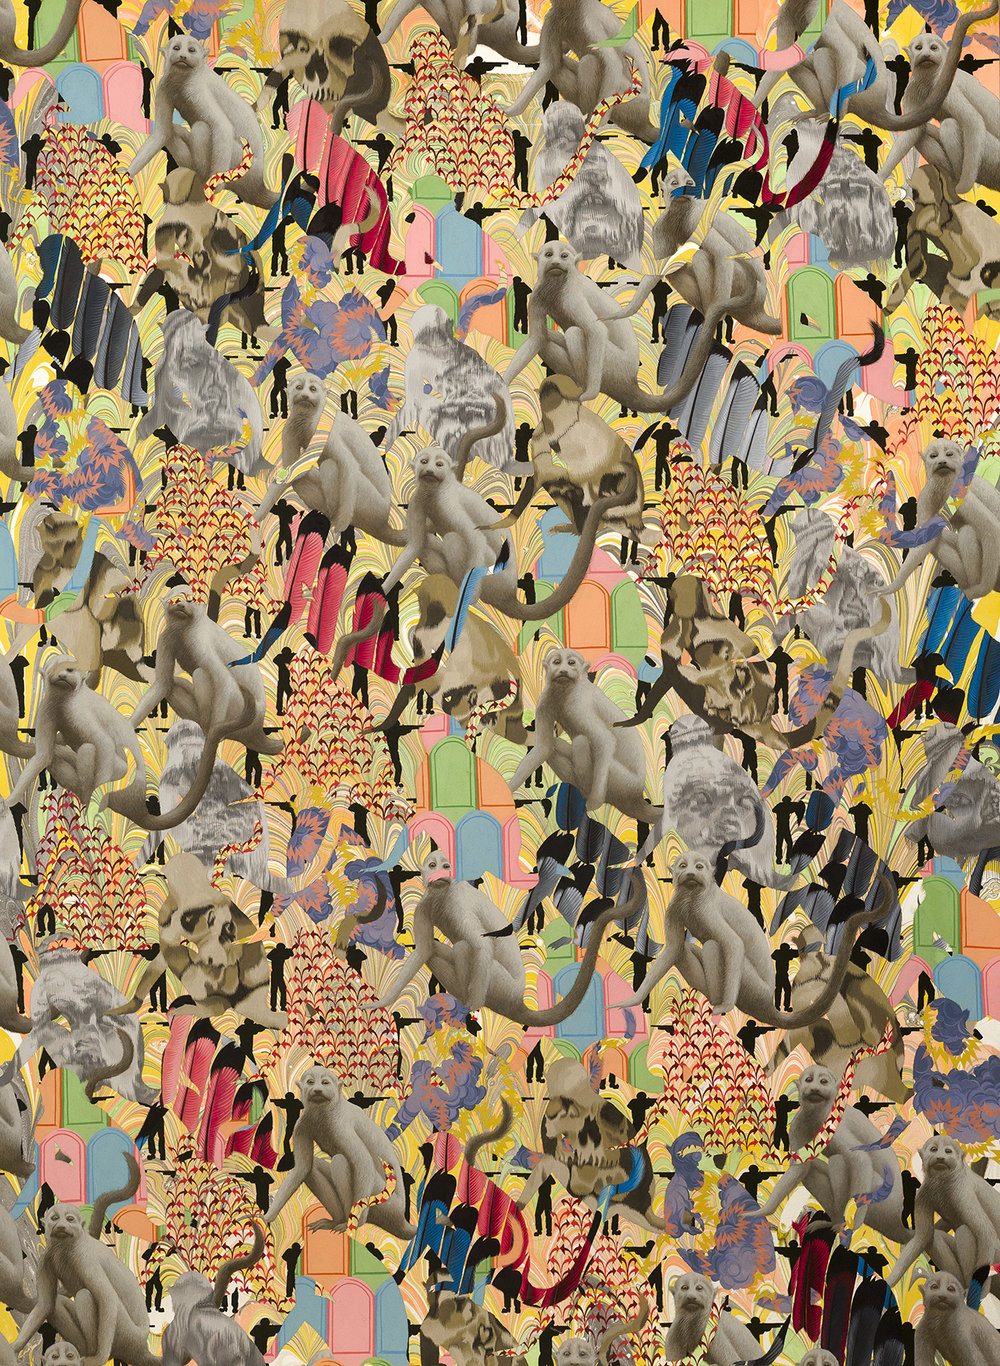 "Zoe Pettijohn Schade/ Crowd of Crowds: 100th Monkey/ 36"" x 49""/ 2017"